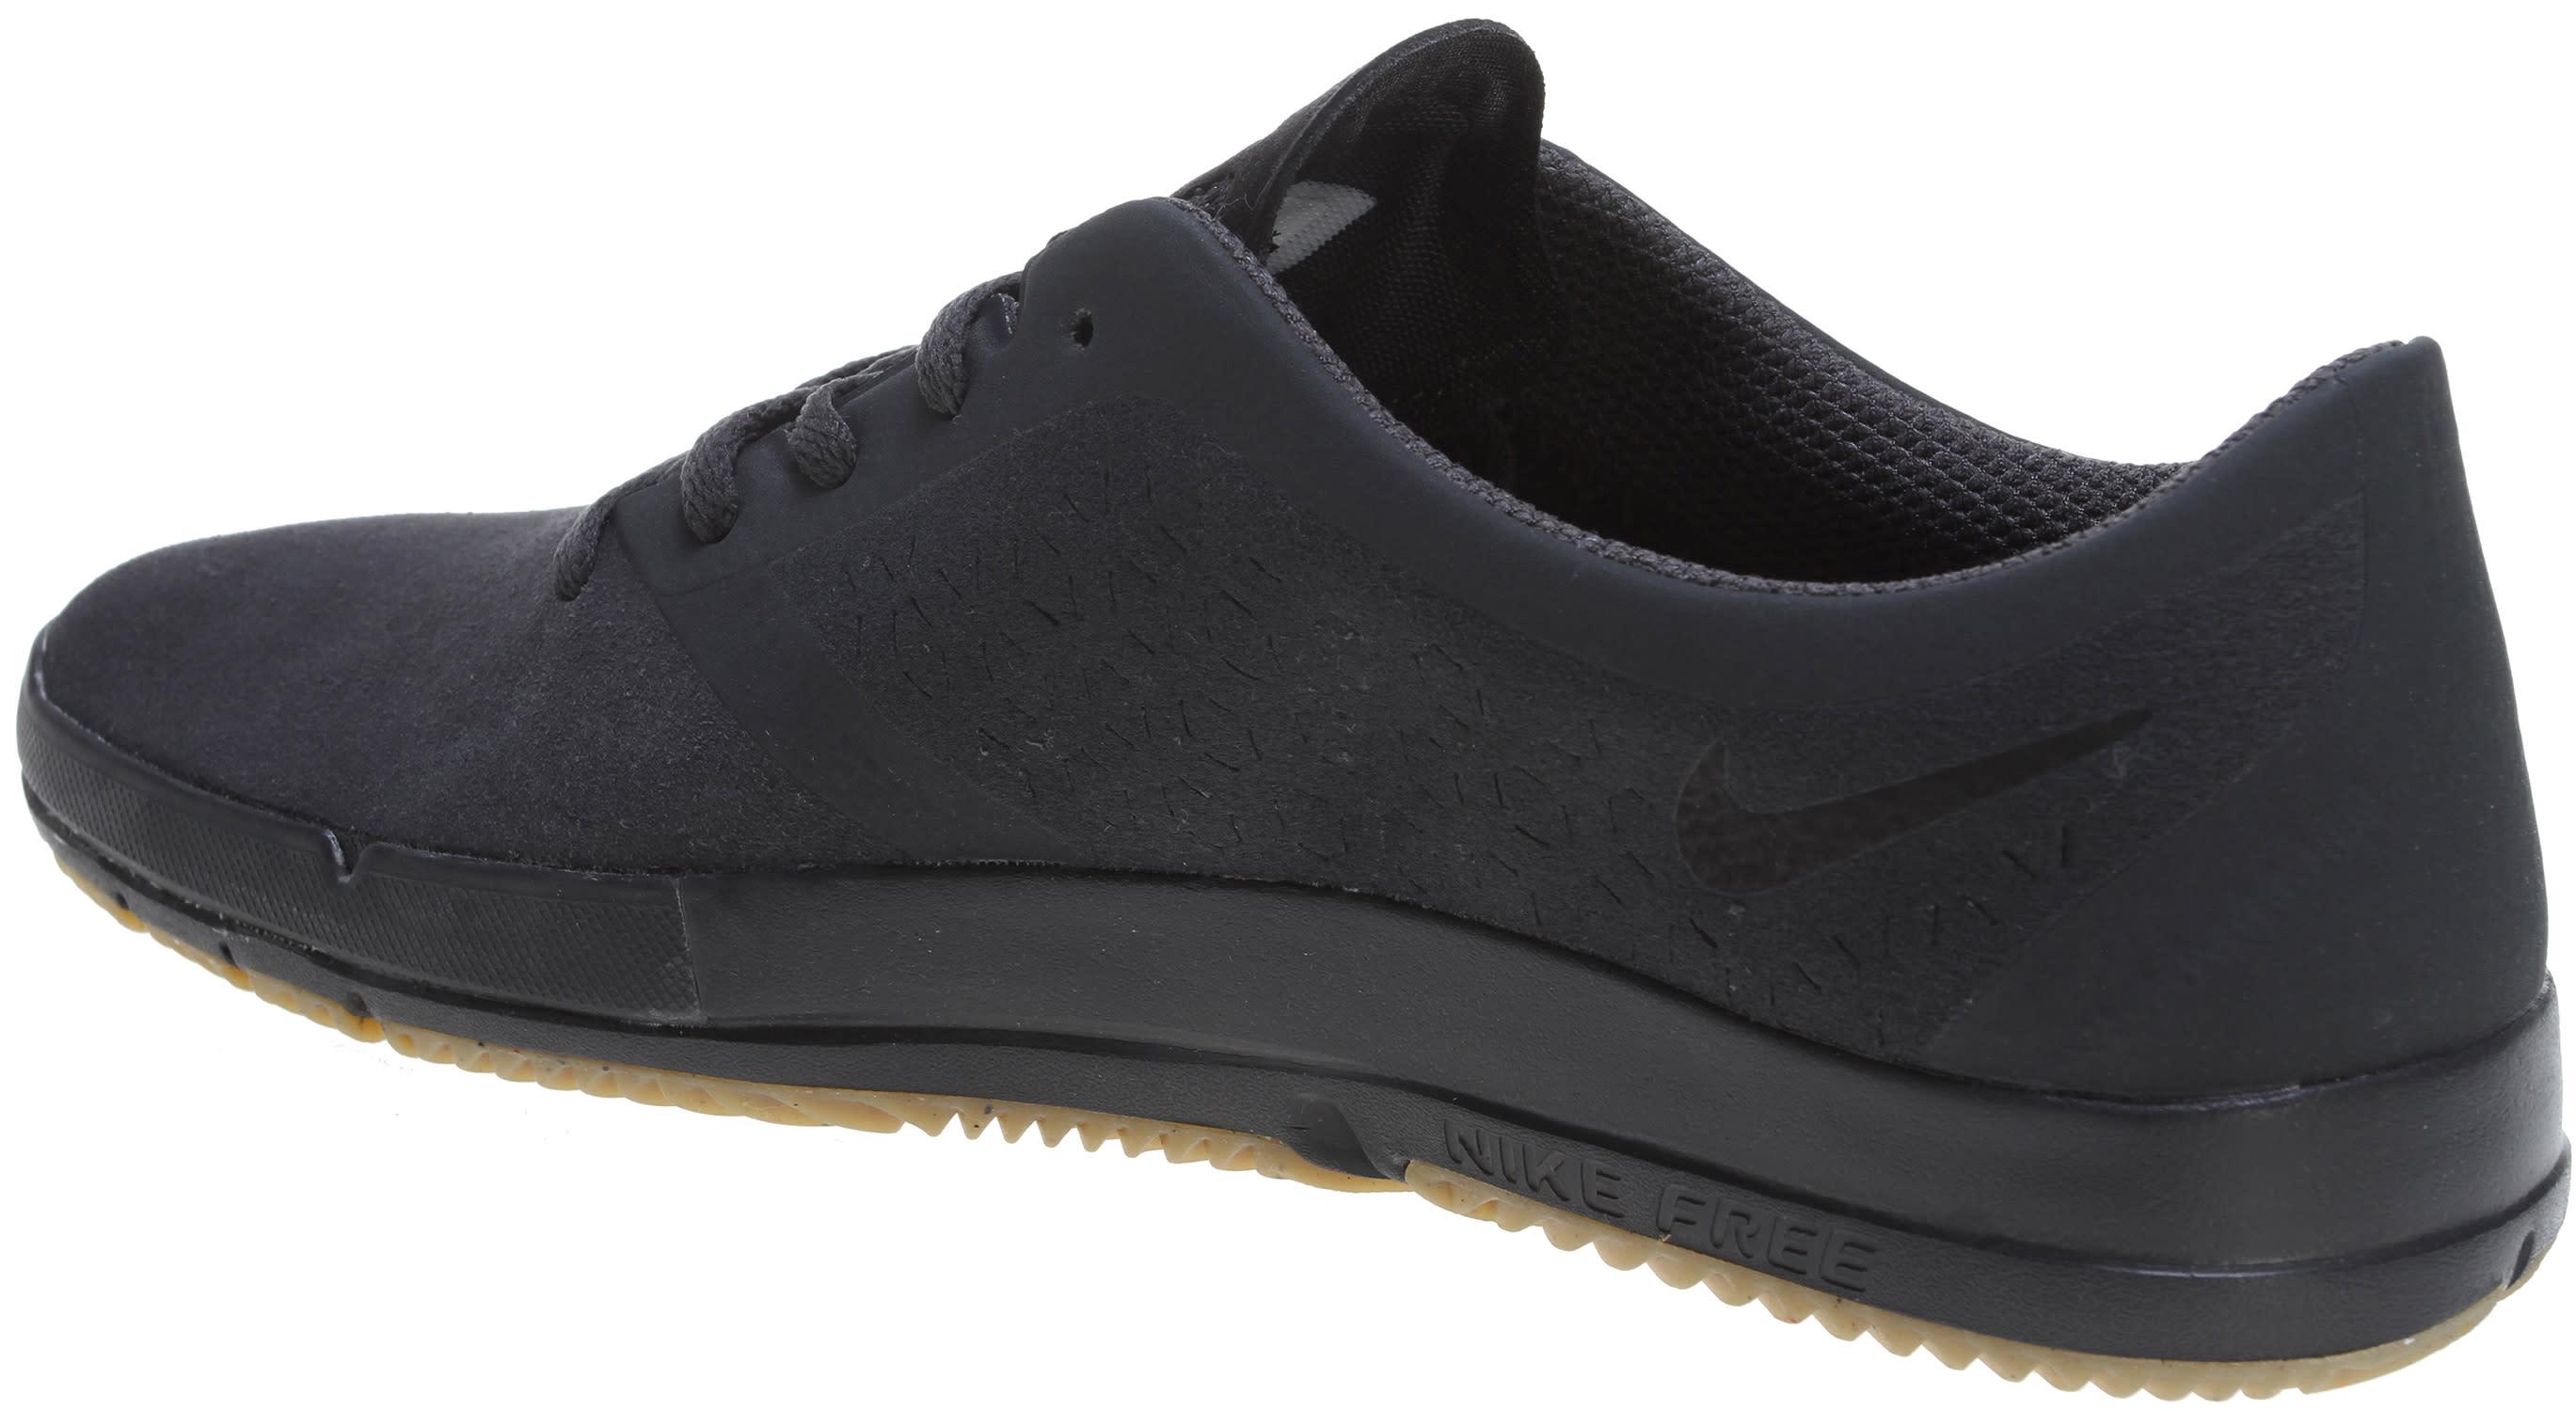 finest selection 2e5c9 4674b Nike Free SB Nano Skate Shoes - thumbnail 3